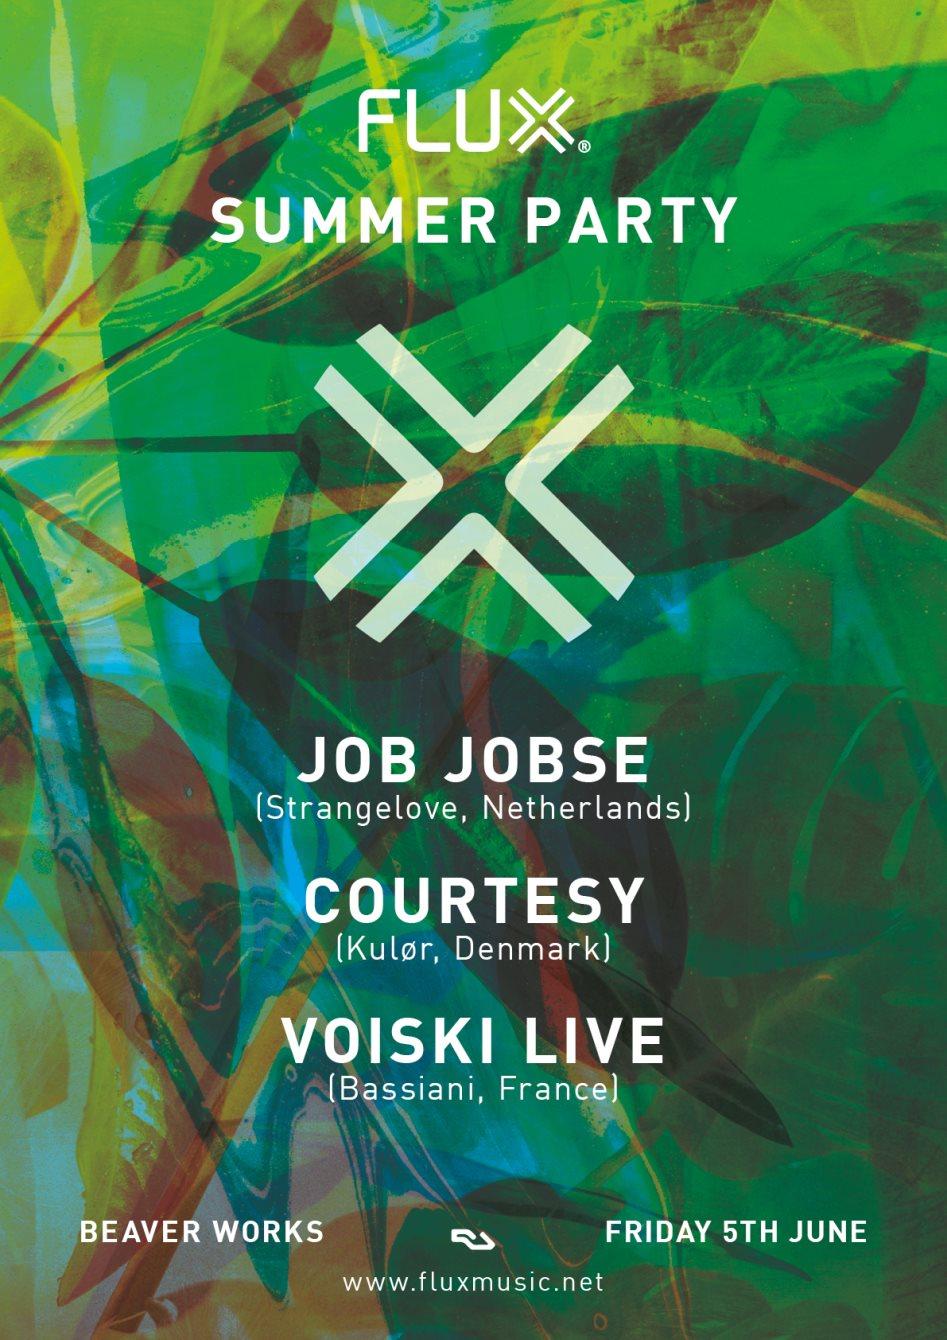 [CANCELLED] Flux Summer Party with Job Jobse, Courtesy & Voiski Live - Flyer back